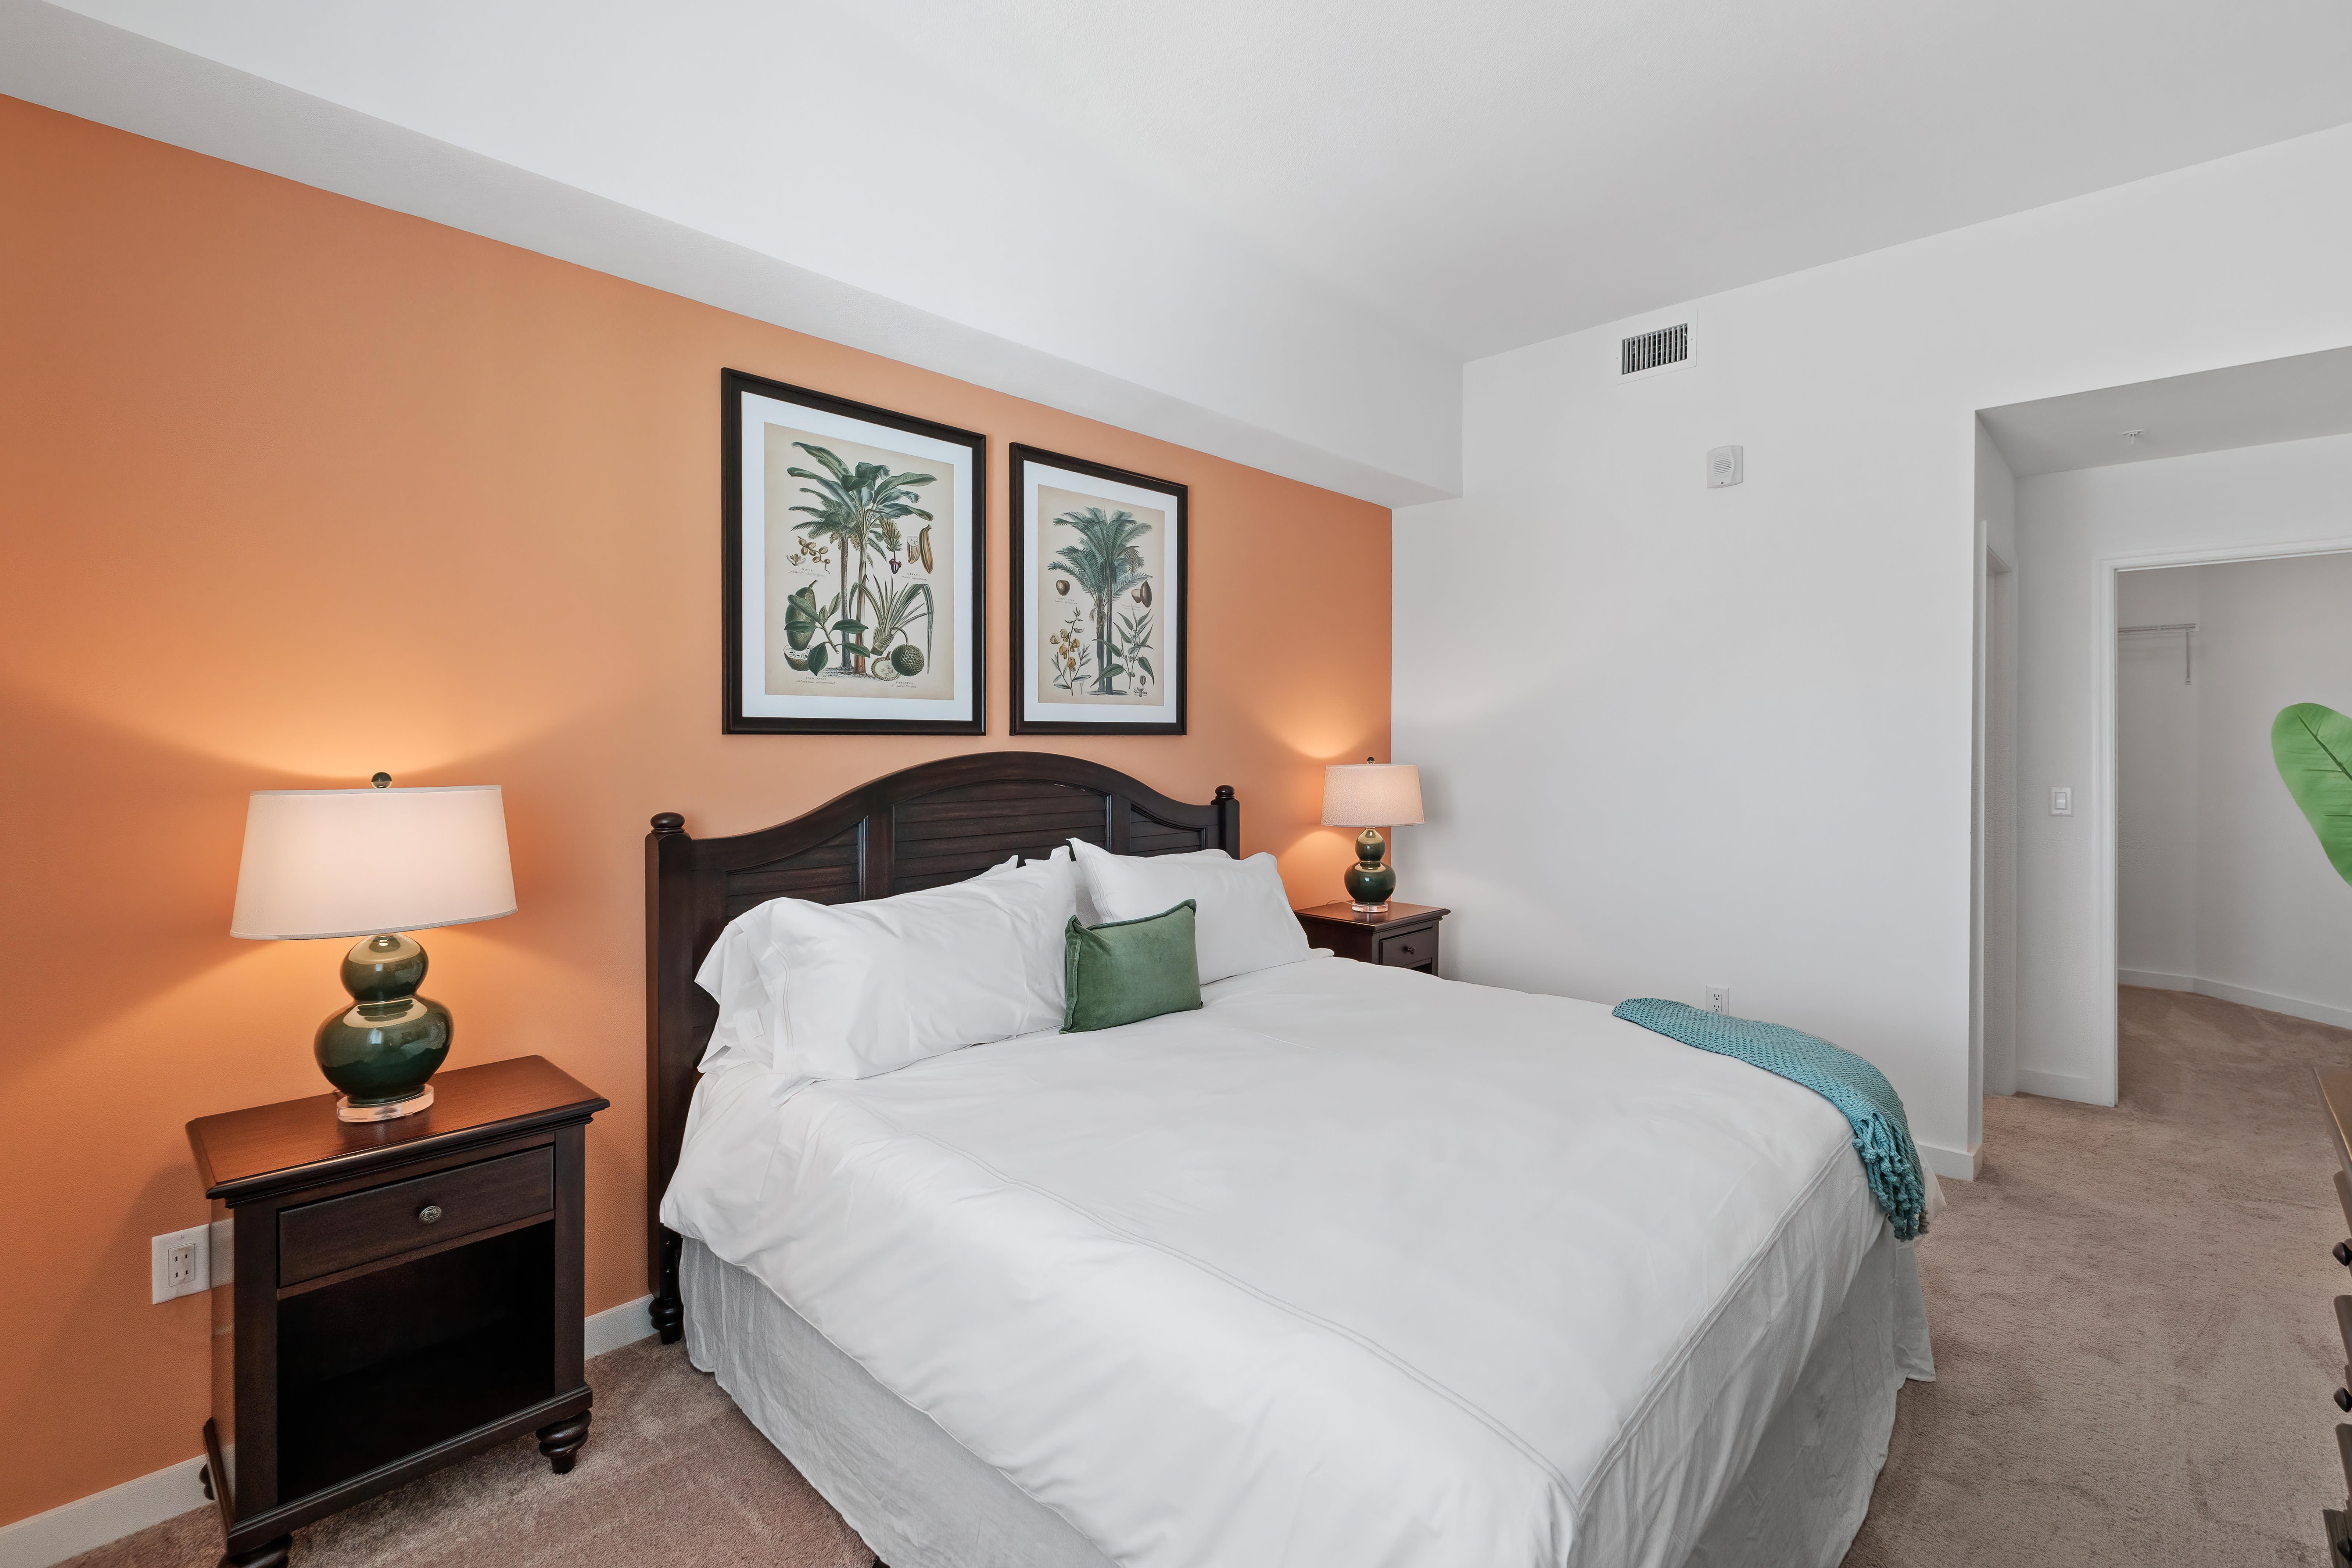 Model bedroom at Town Lantana in Lantana, Florida